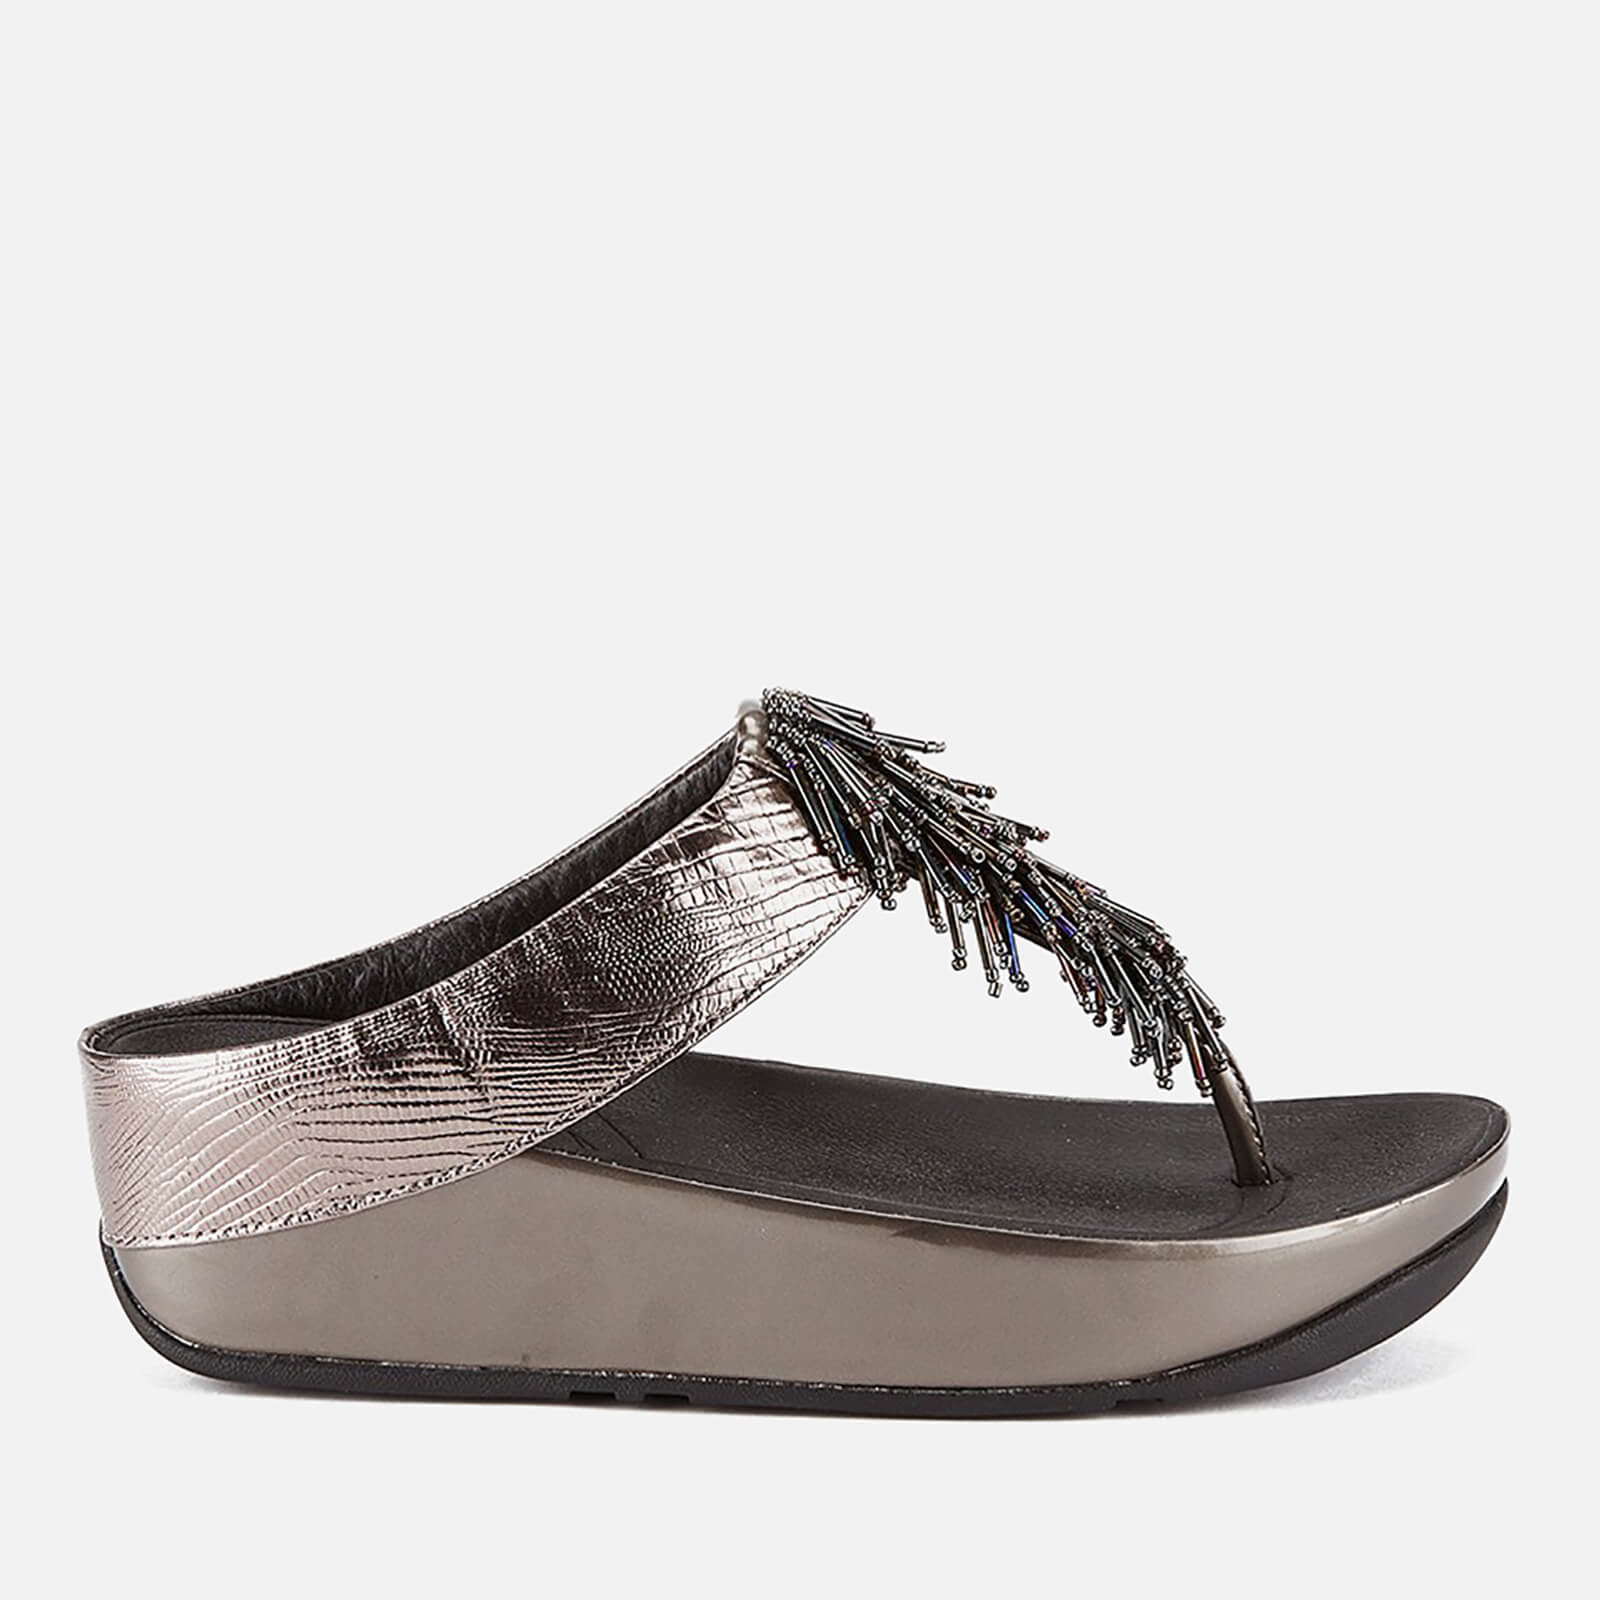 488c40905 FitFlop Women's Cha Cha Leather/Suede Tassel Toe Post Sandals - Nimbus  Silver Womens Footwear | TheHut.com